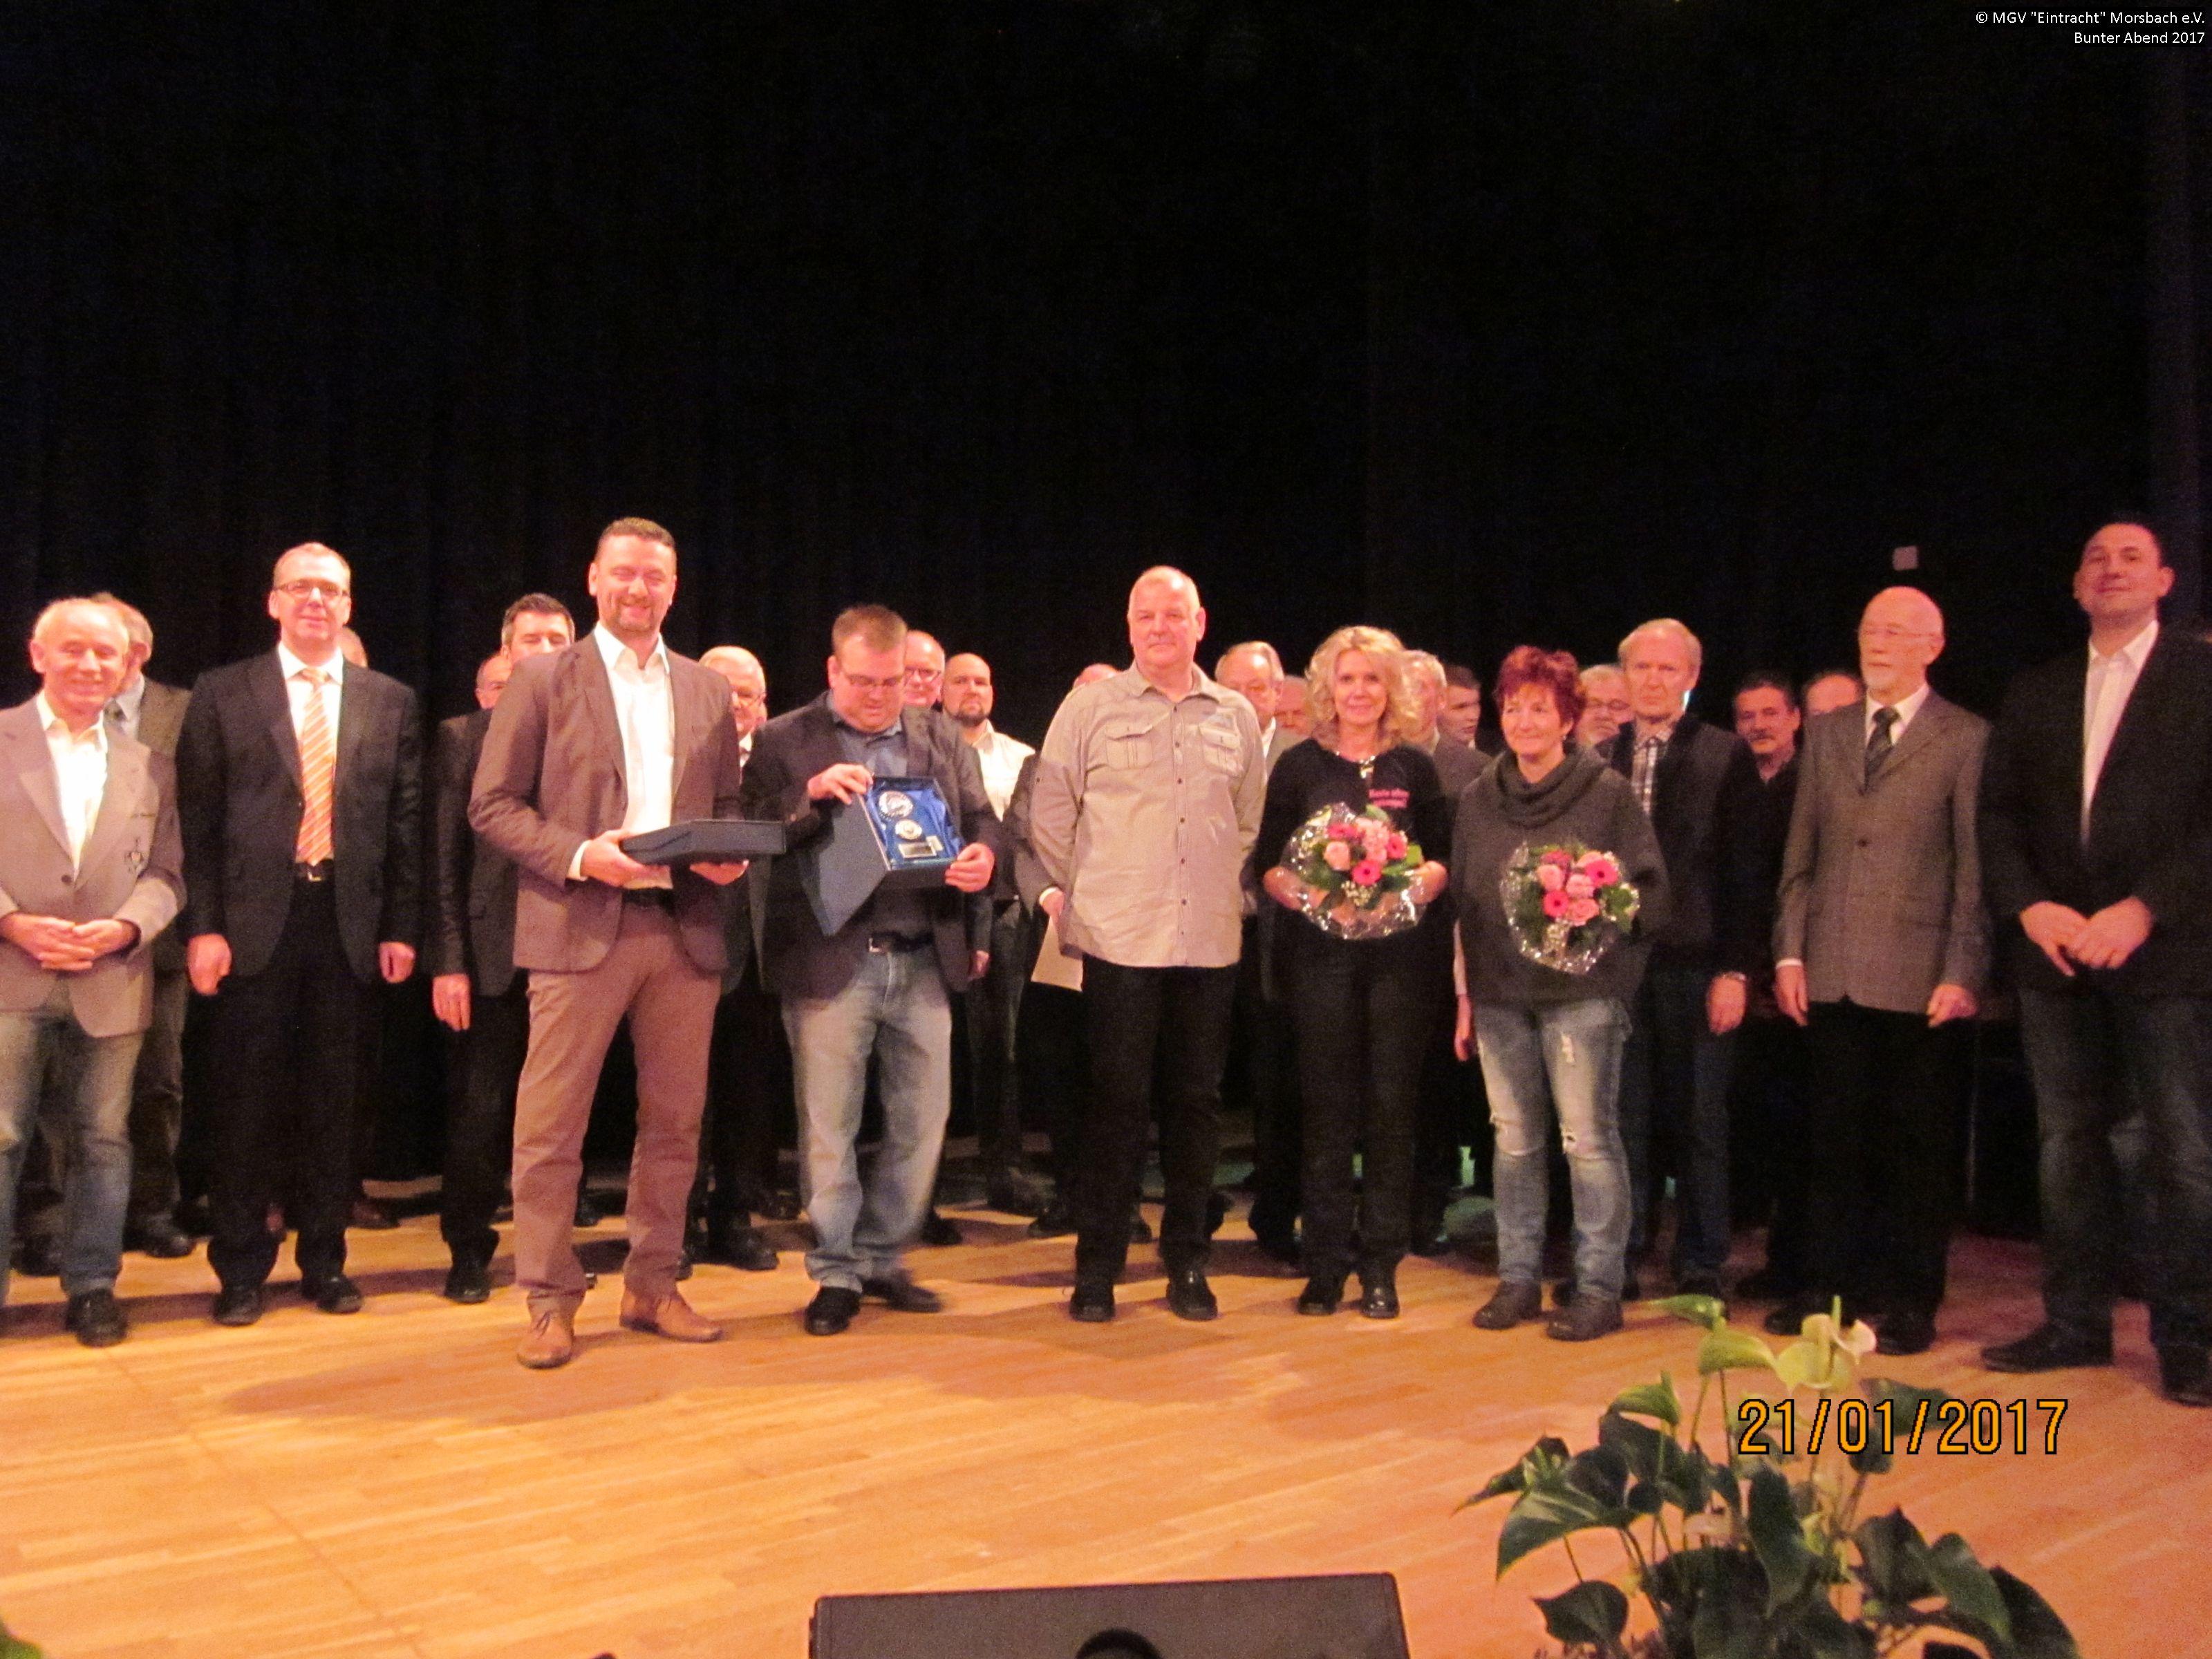 MGV_Eintracht_Morsbach_Bunter_Abend_2017_180